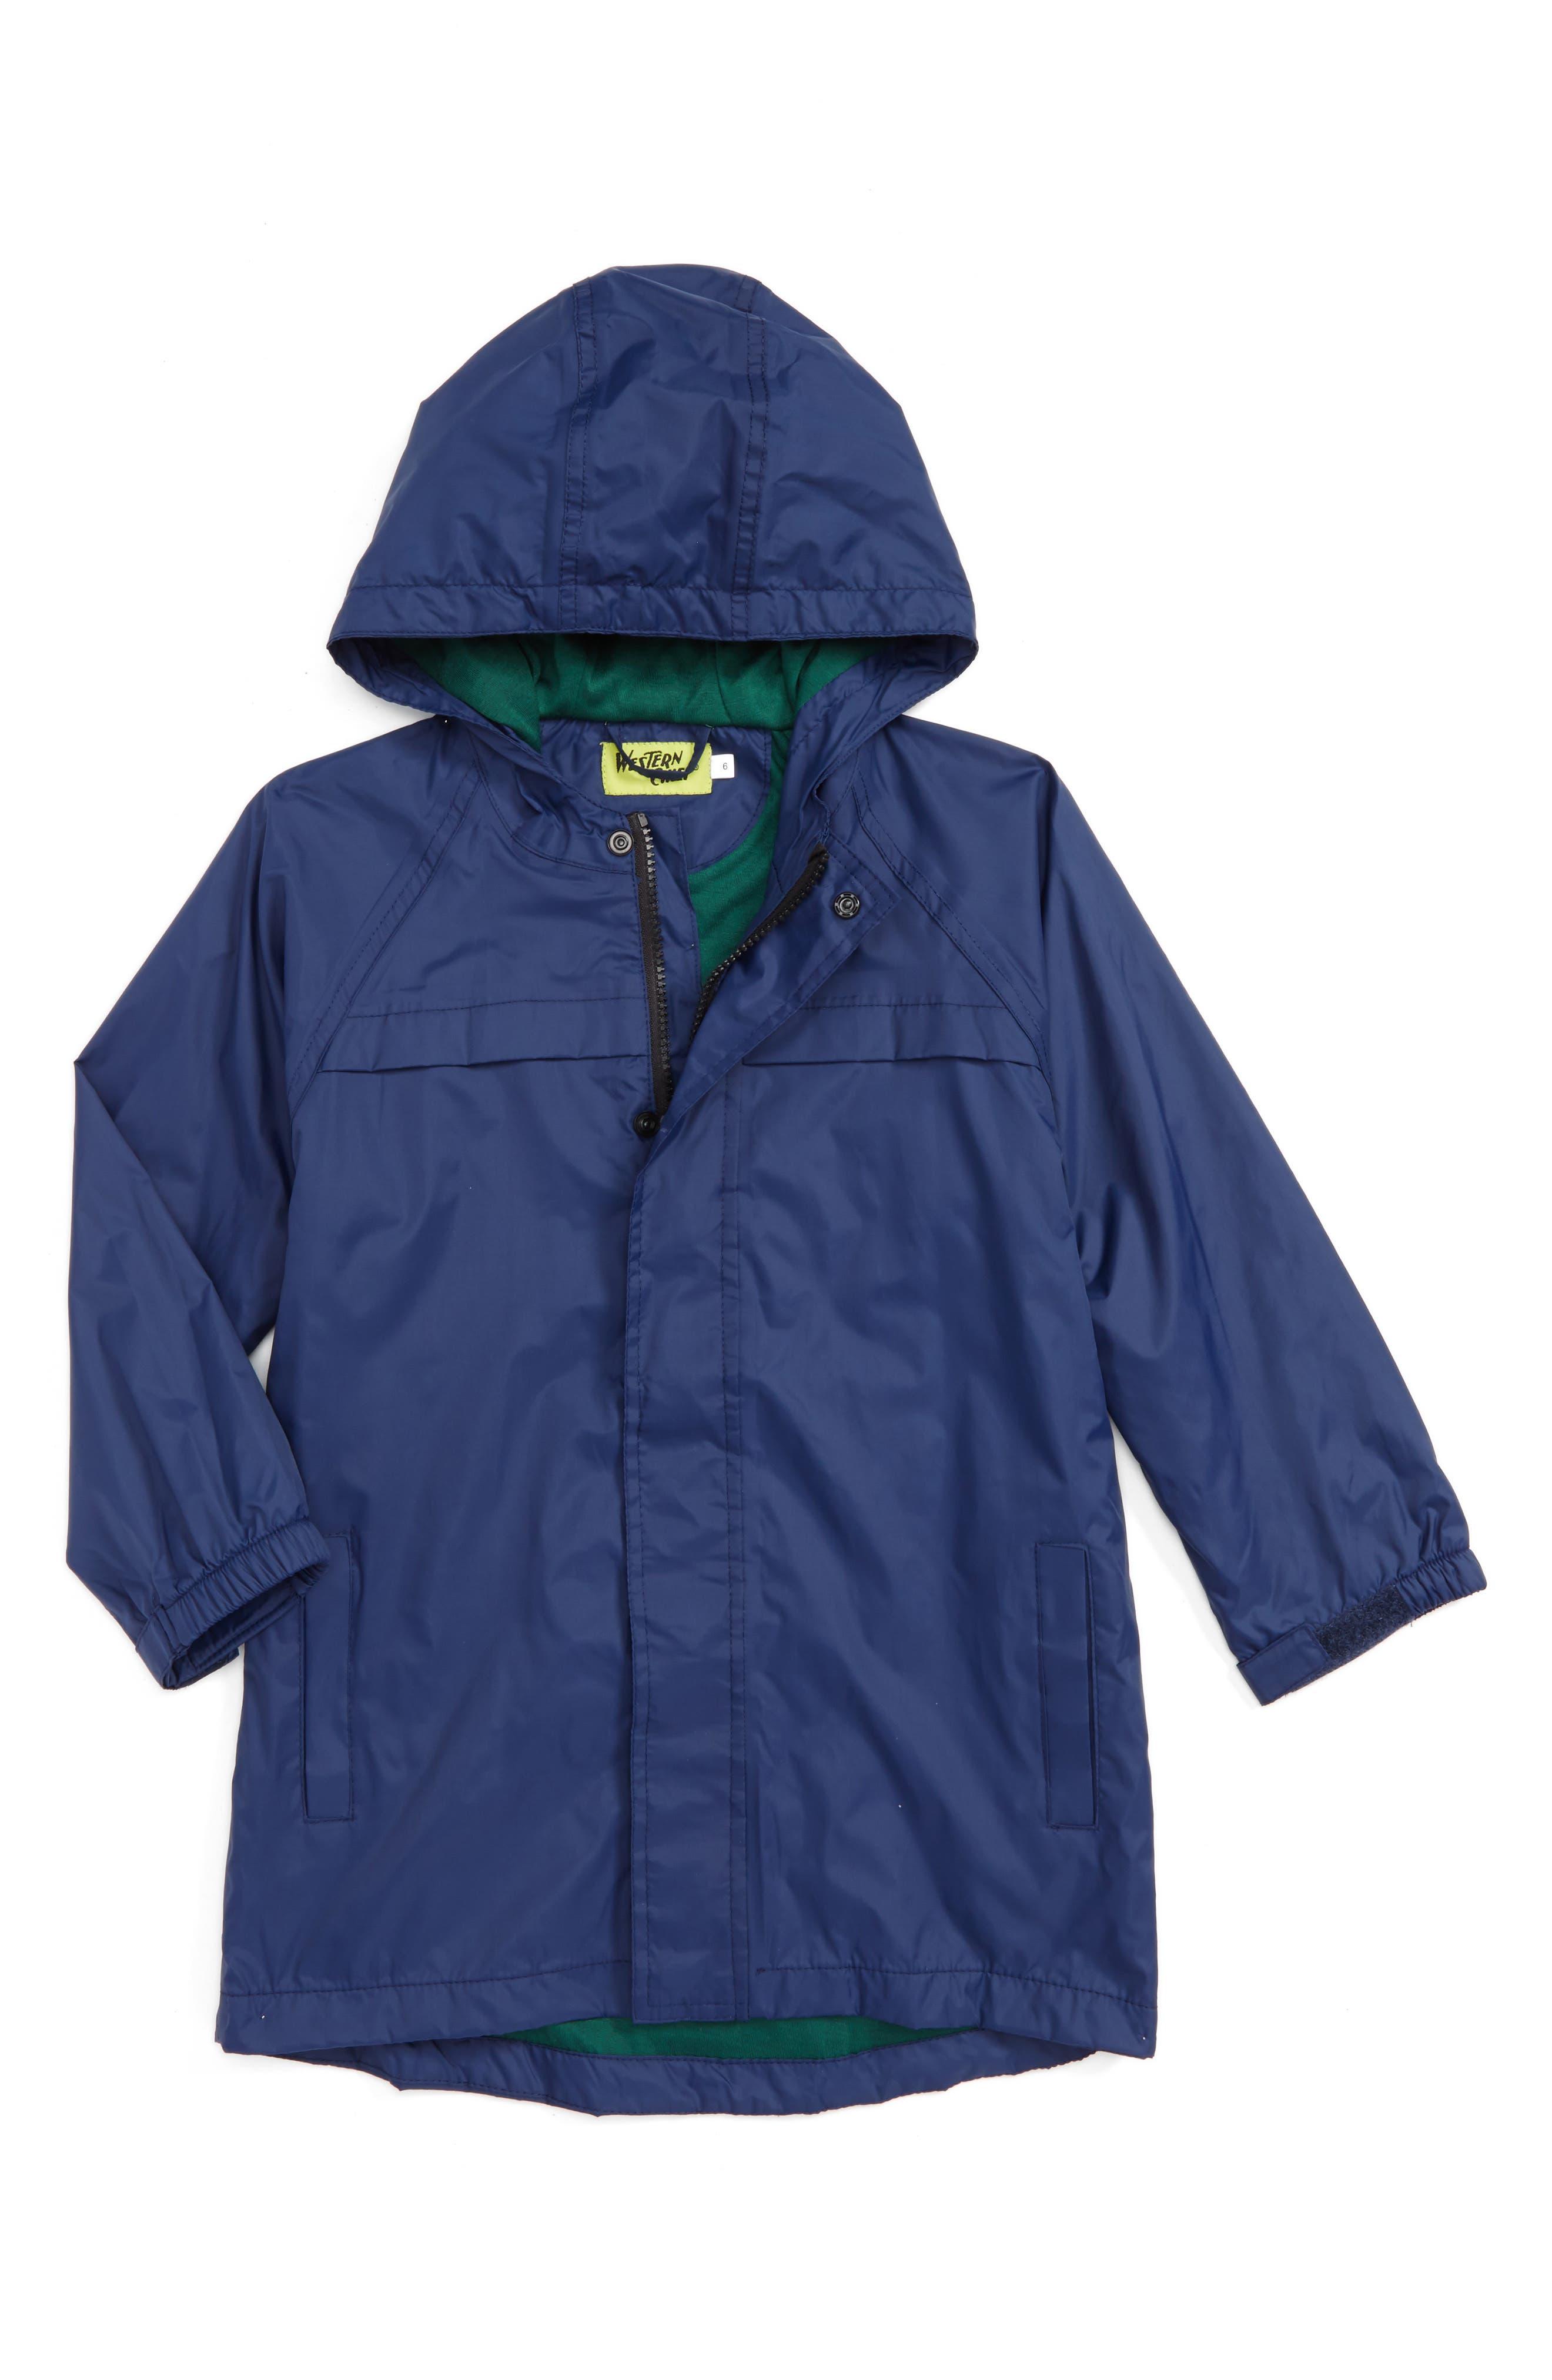 Main Image - Western Chief Raincoat (Toddler, Little Kid & Big Kid)